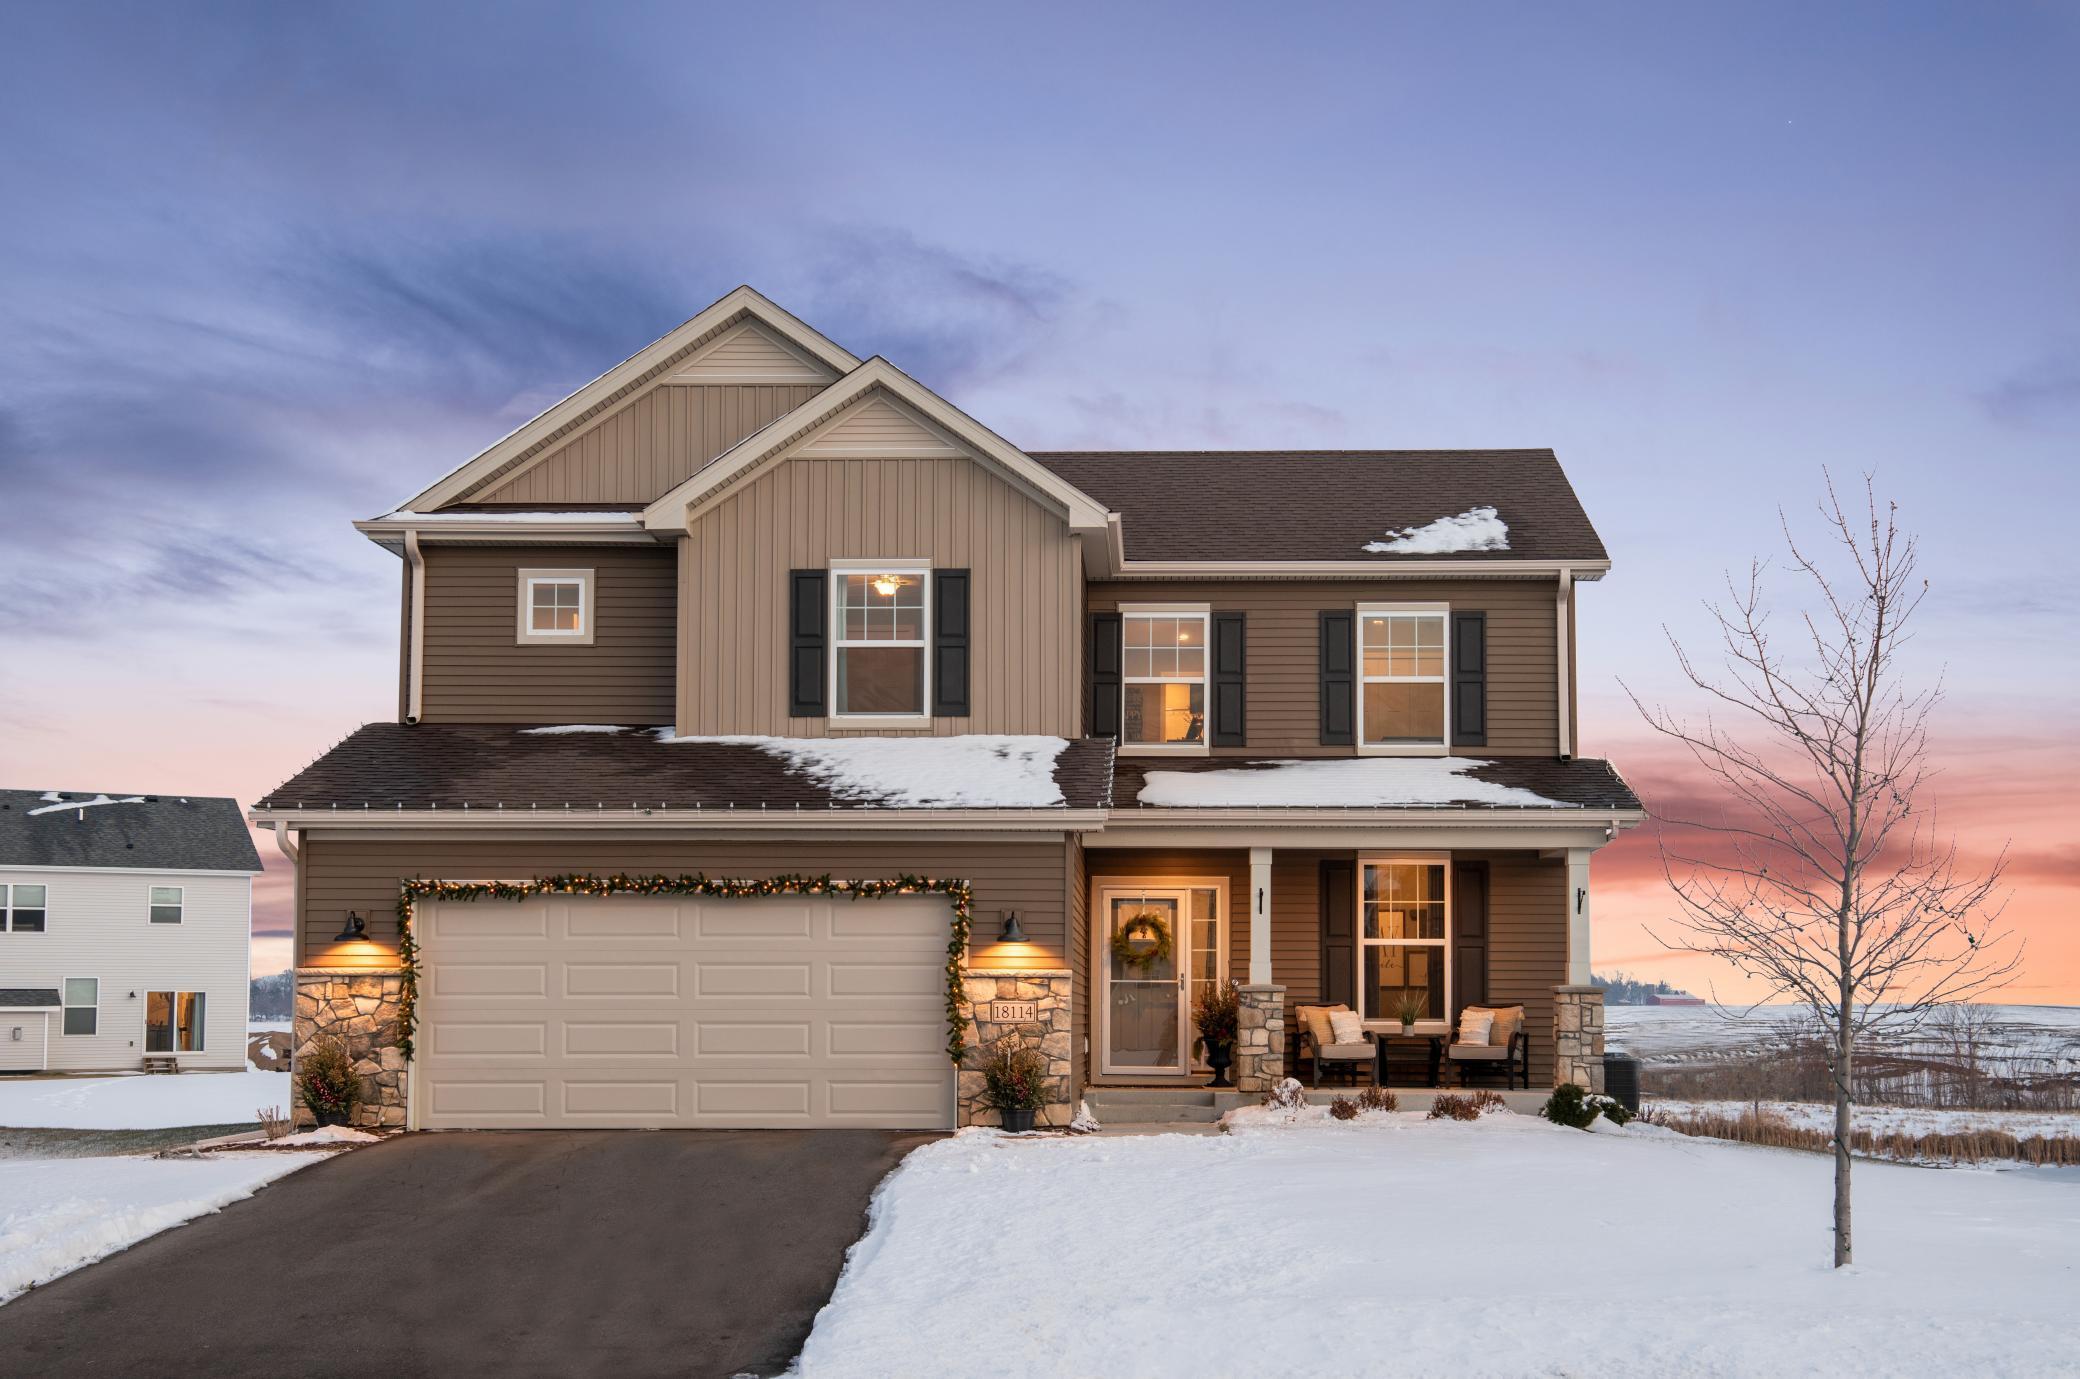 18114 Gladstone Trail Property Photo - Lakeville, MN real estate listing